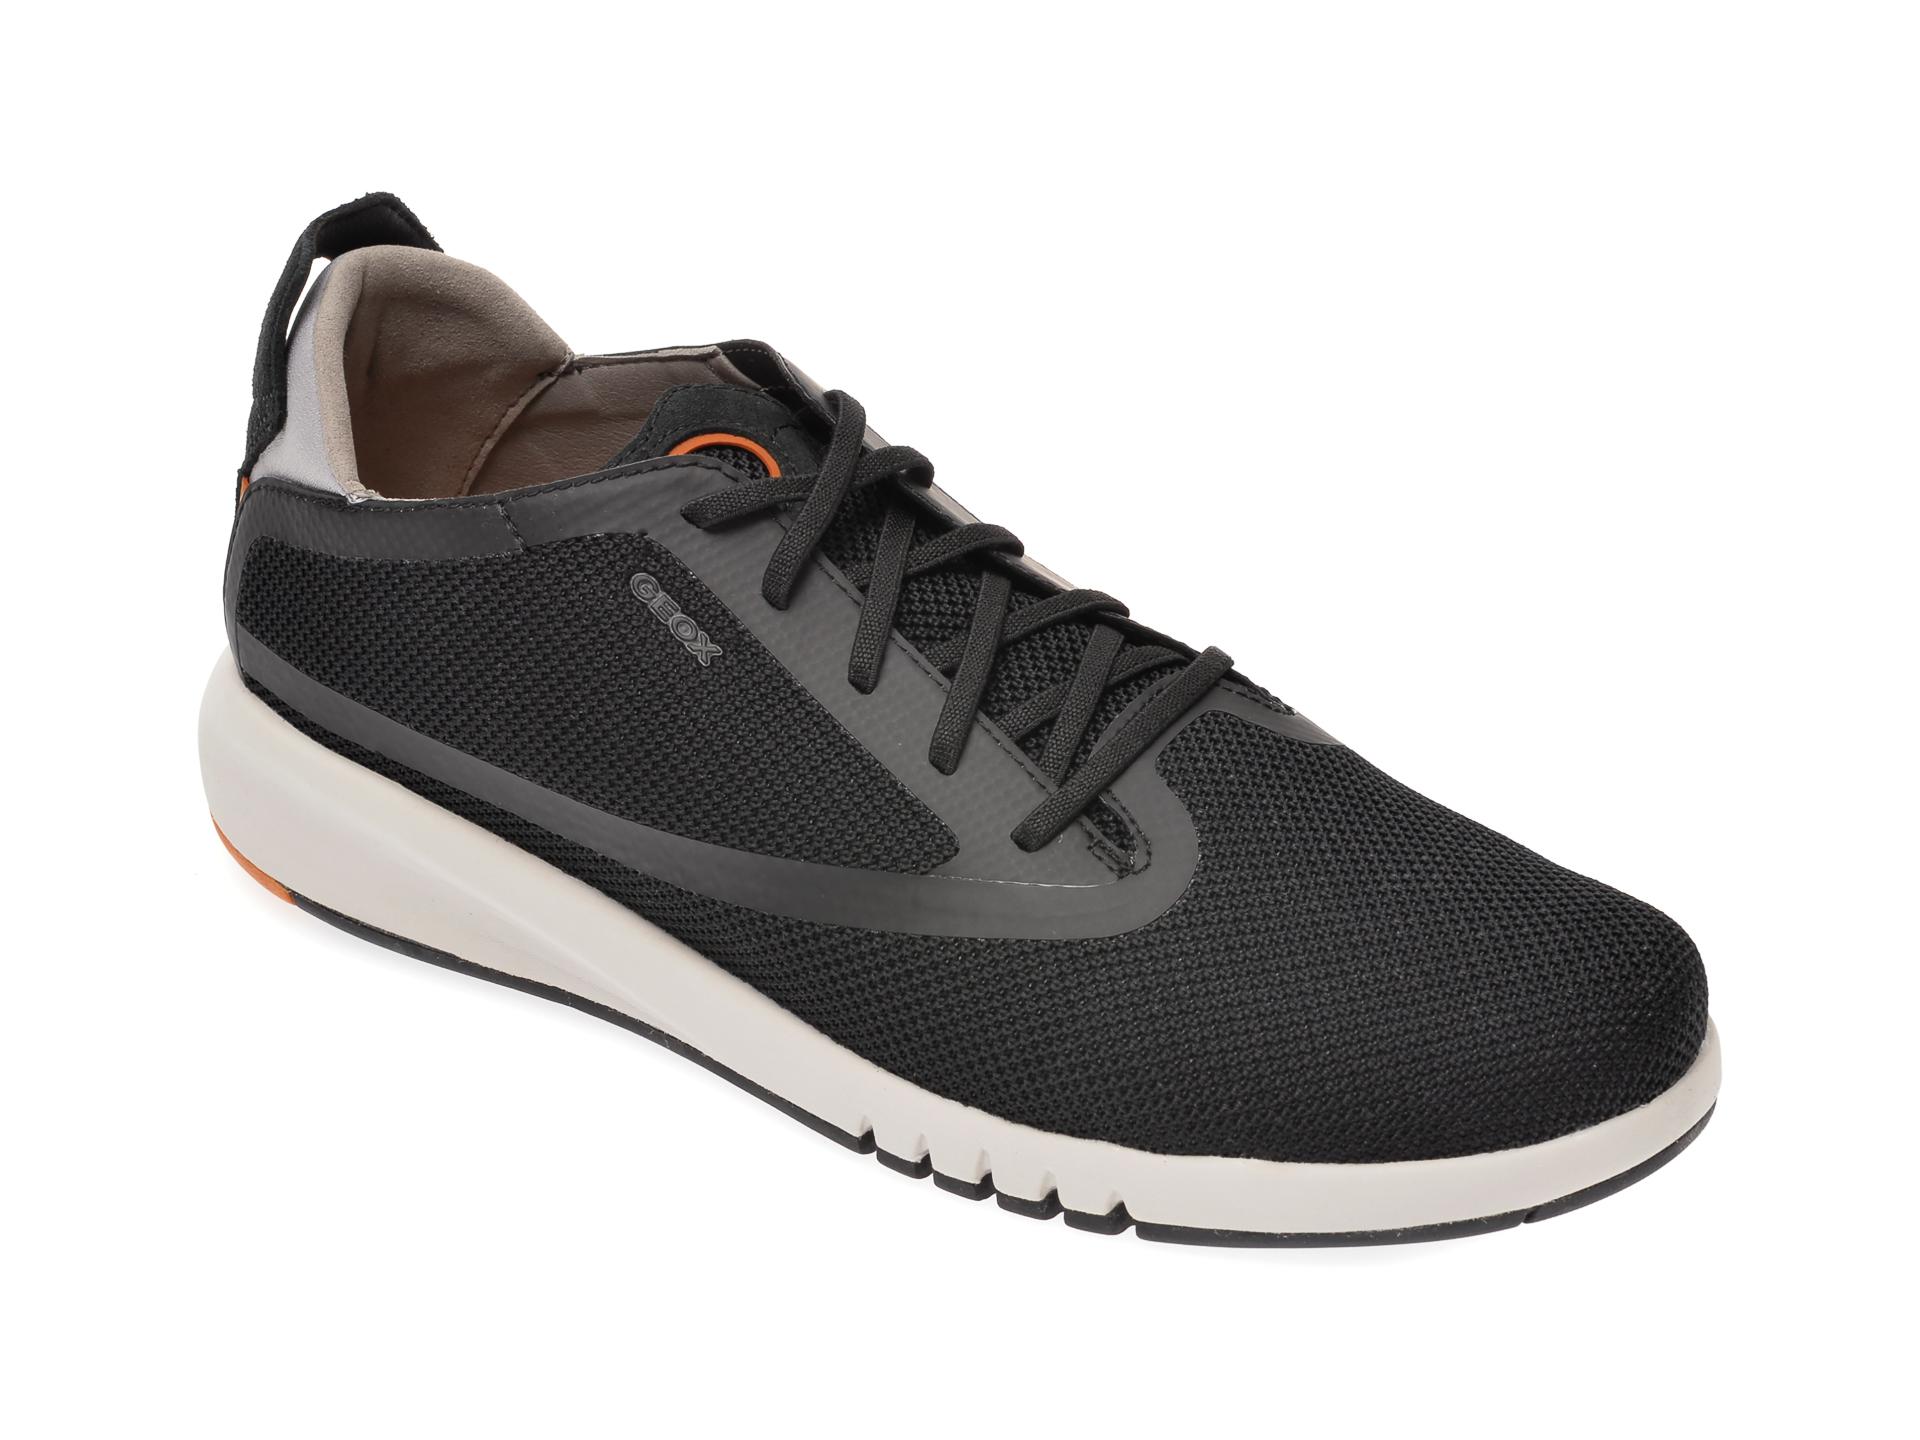 Pantofi sport GEOX negri, U027XA, din material textil si piele naturala